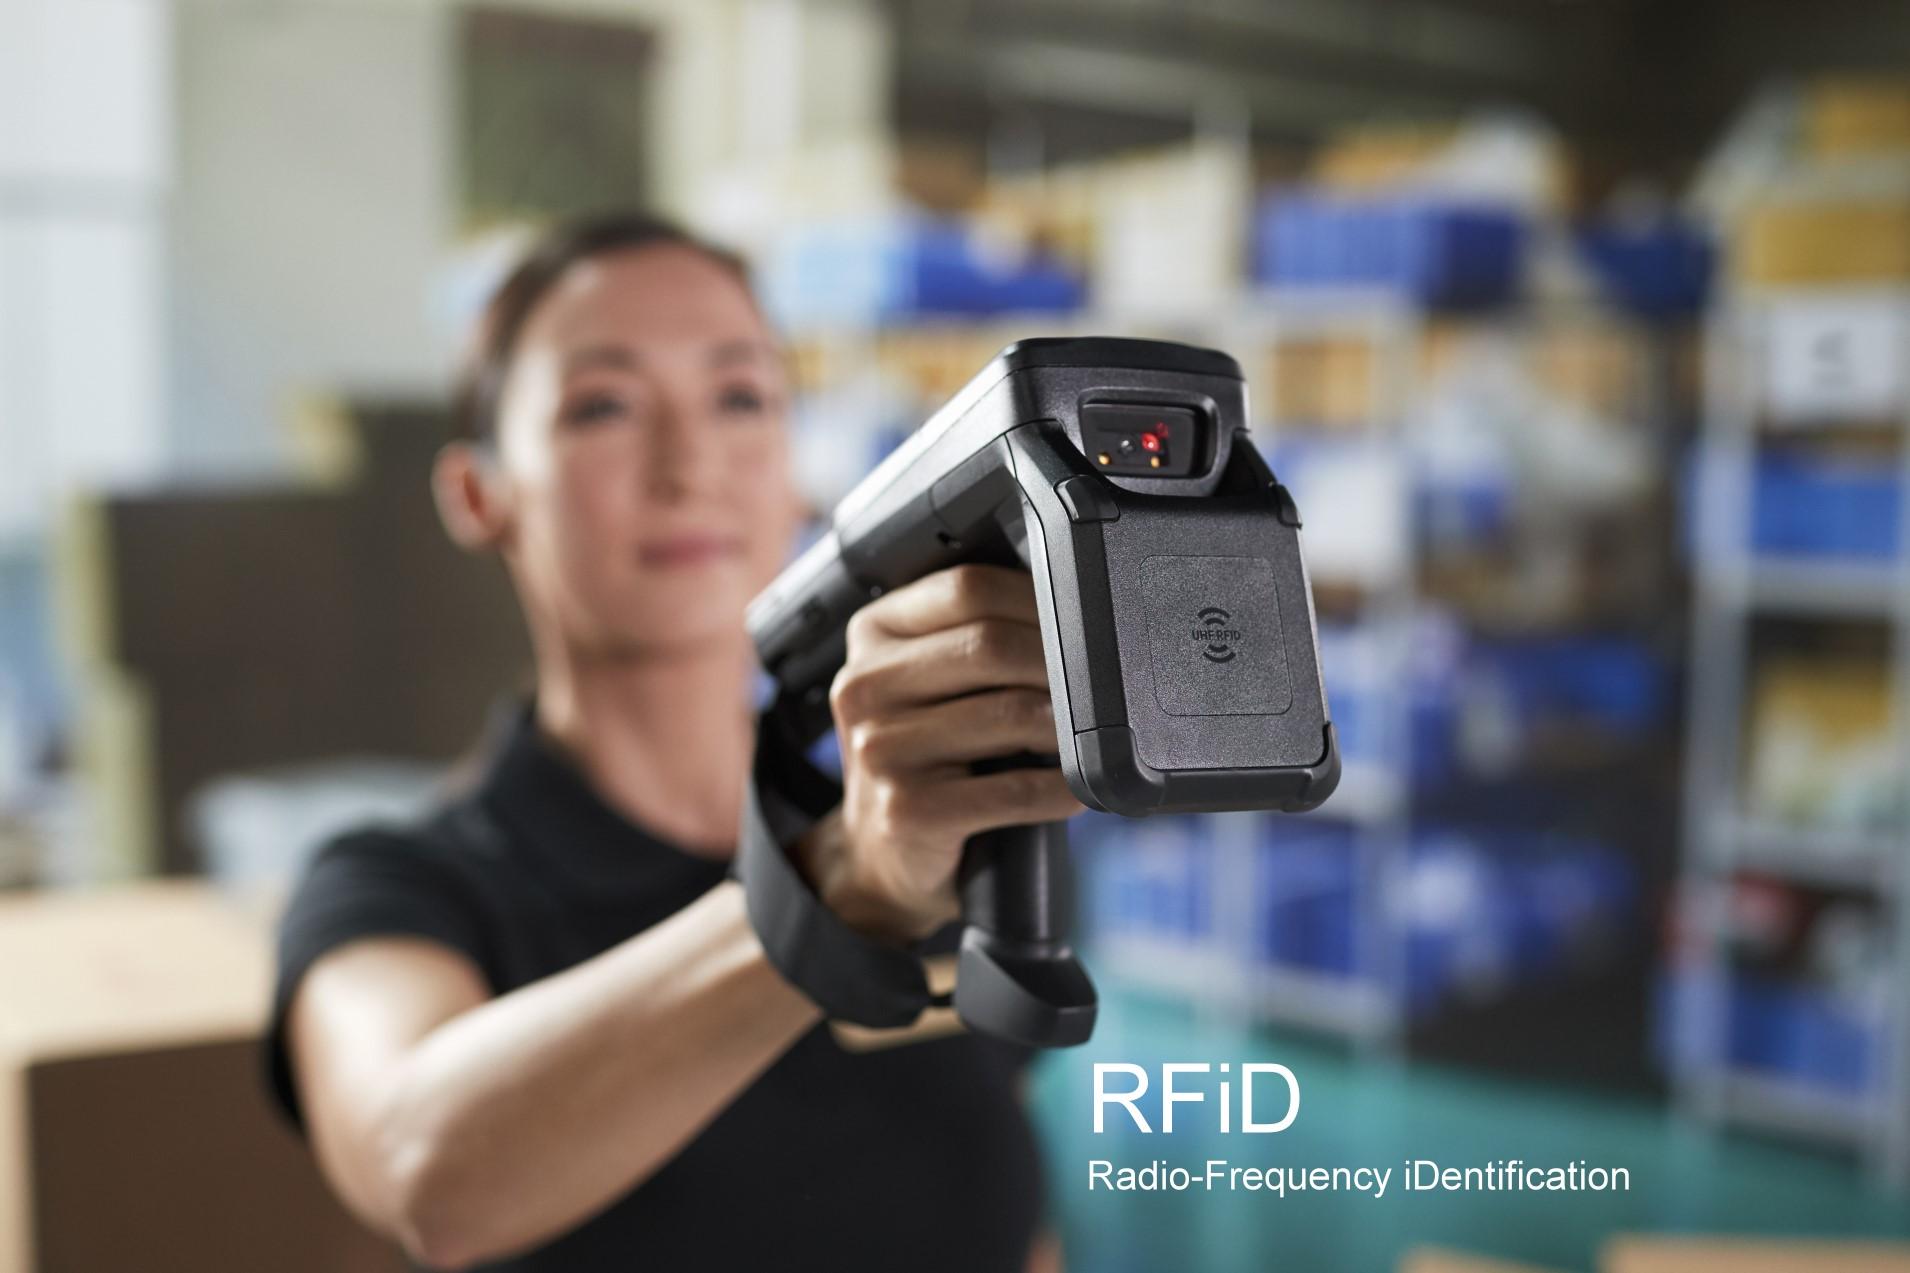 Zebra MC3330r-RFID